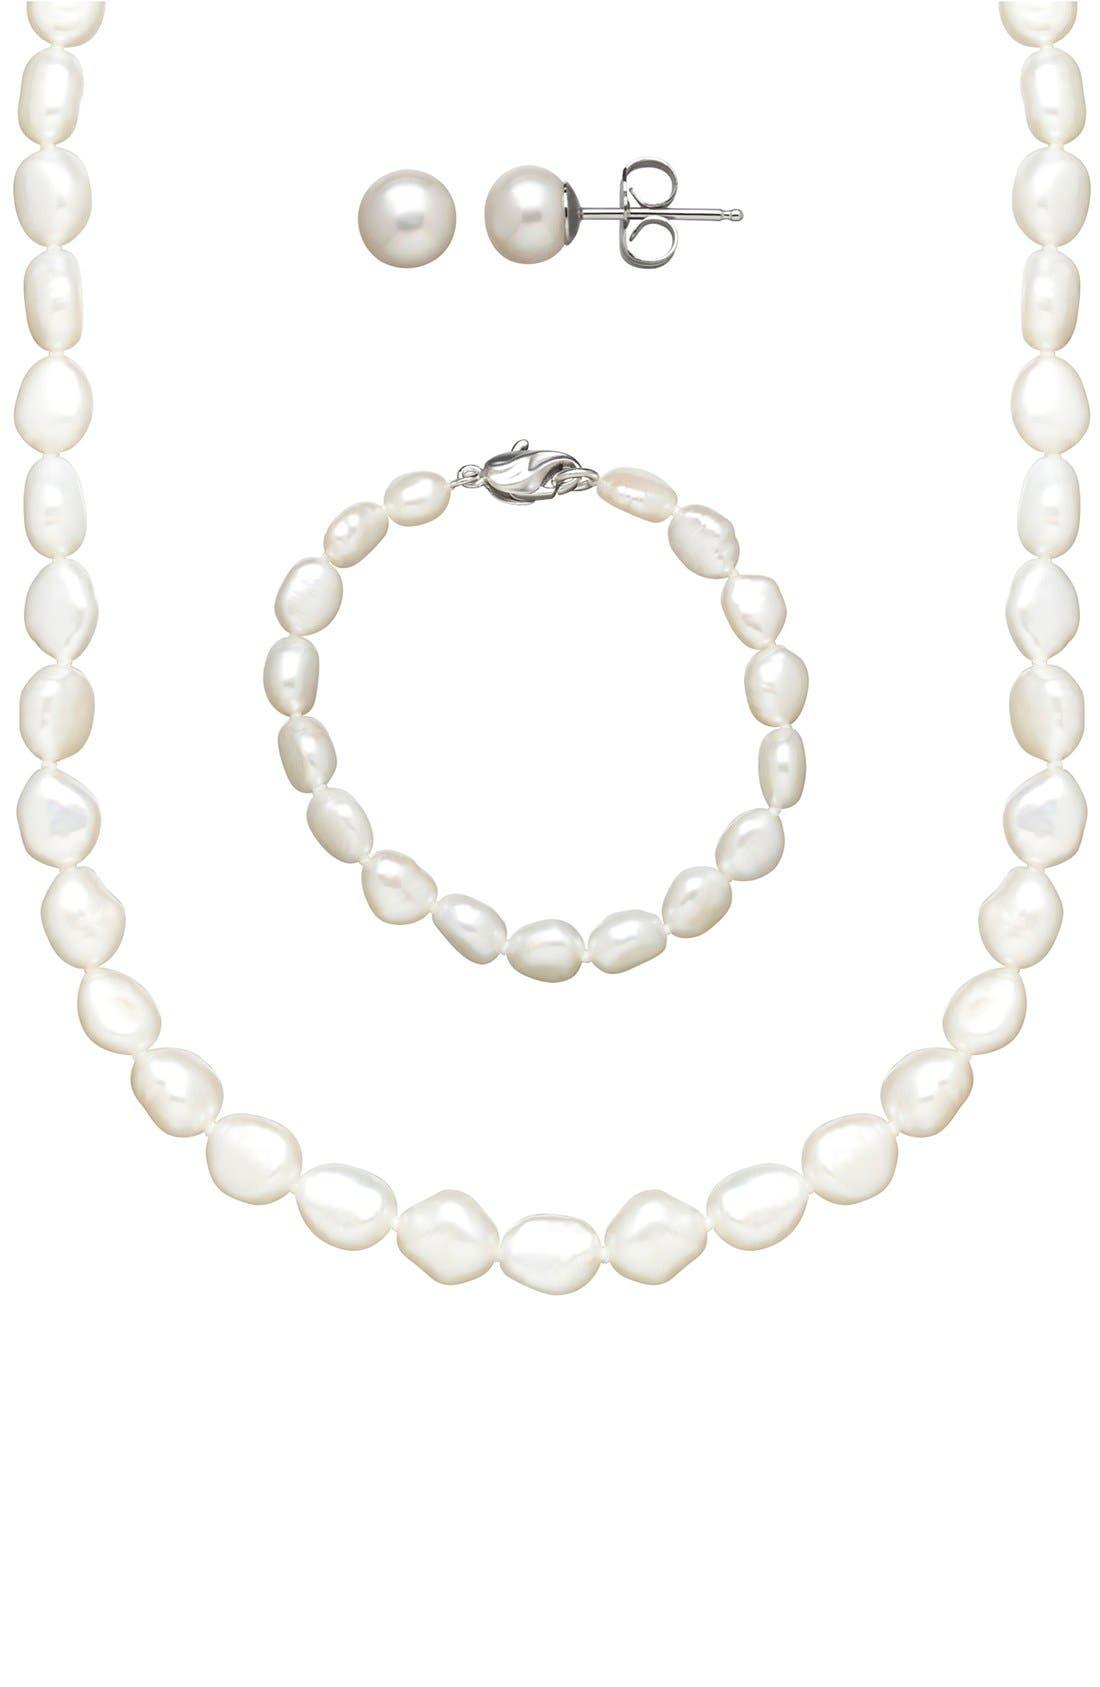 Freshwater Pearl Necklace, Bracelet & Earrings,                         Main,                         color, White